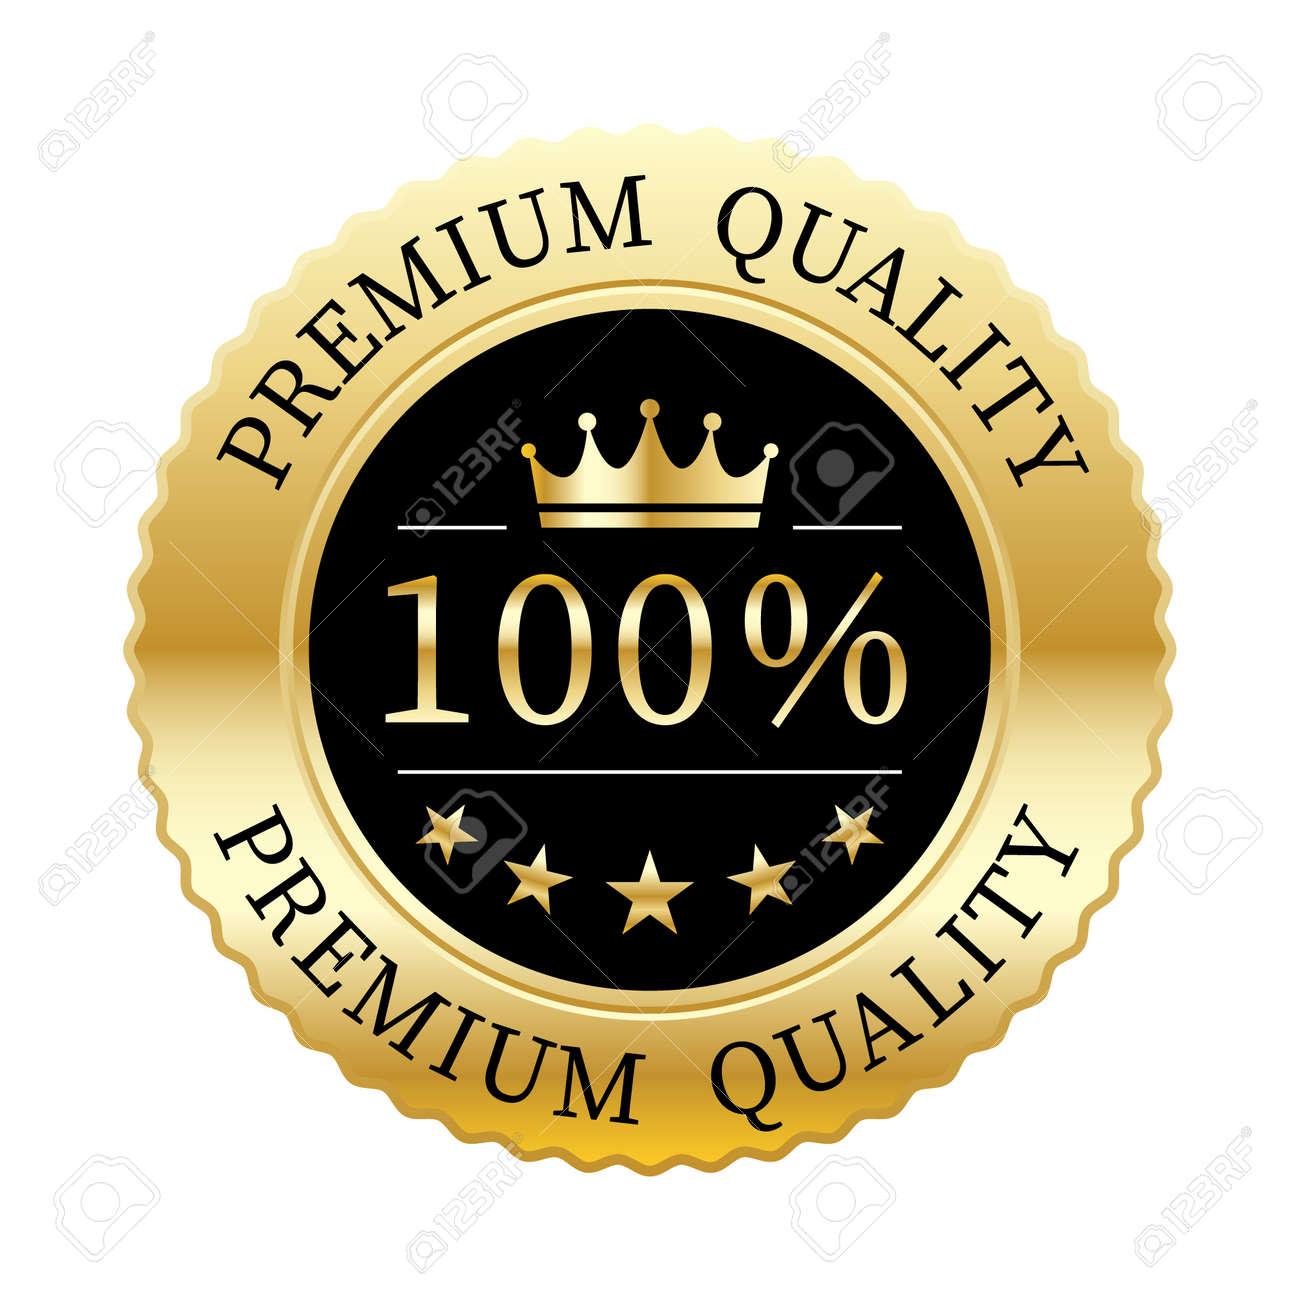 100% premium quality crown and 5 stars badge gold metallic logo - 156819020